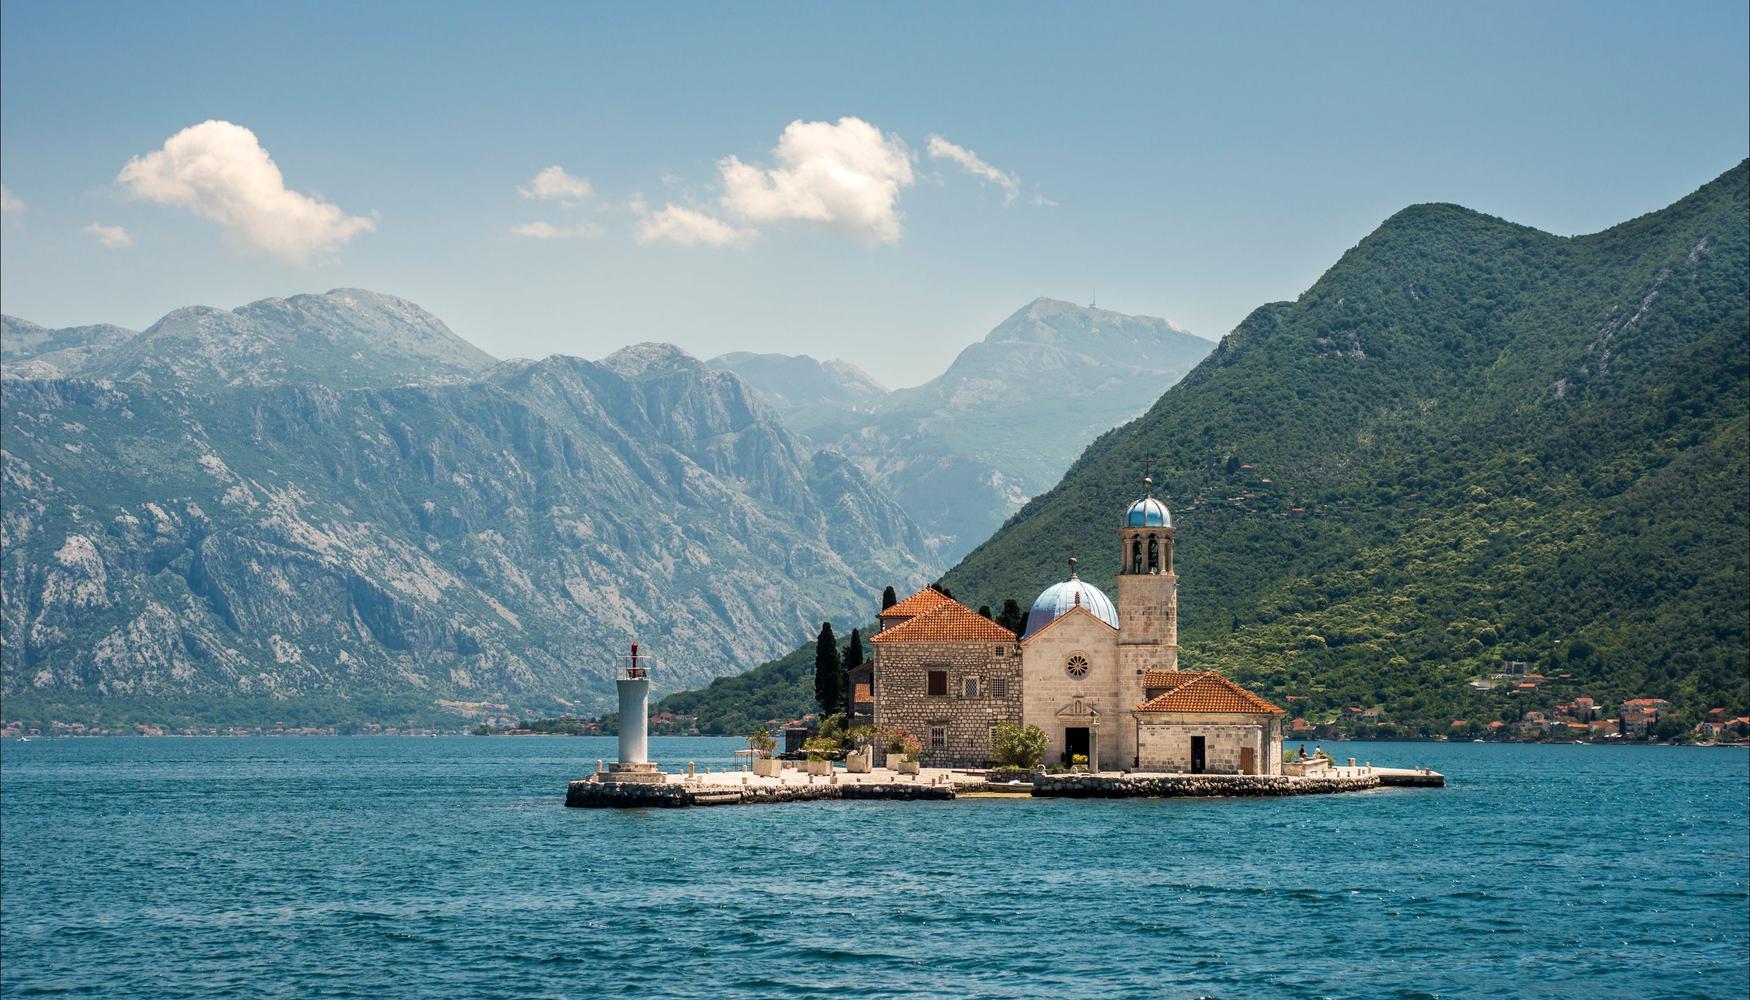 Renta de autos en Montenegro